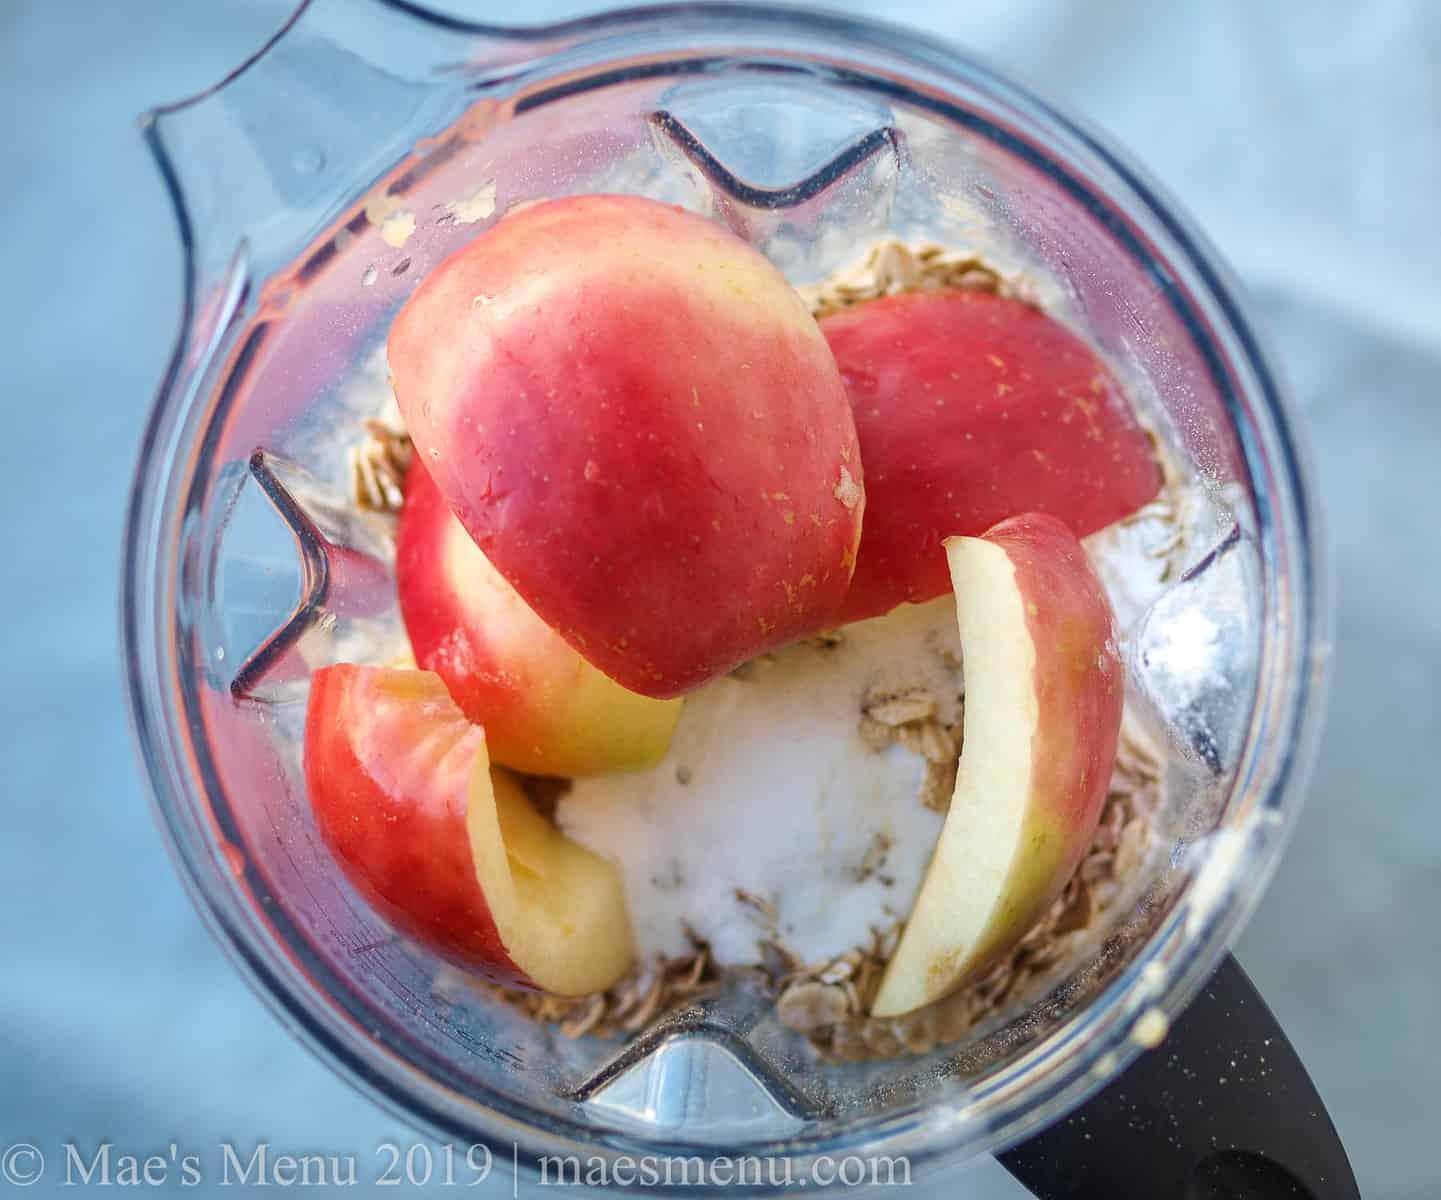 Gluten-free apple blender cake ingredients in a blender pitcher.